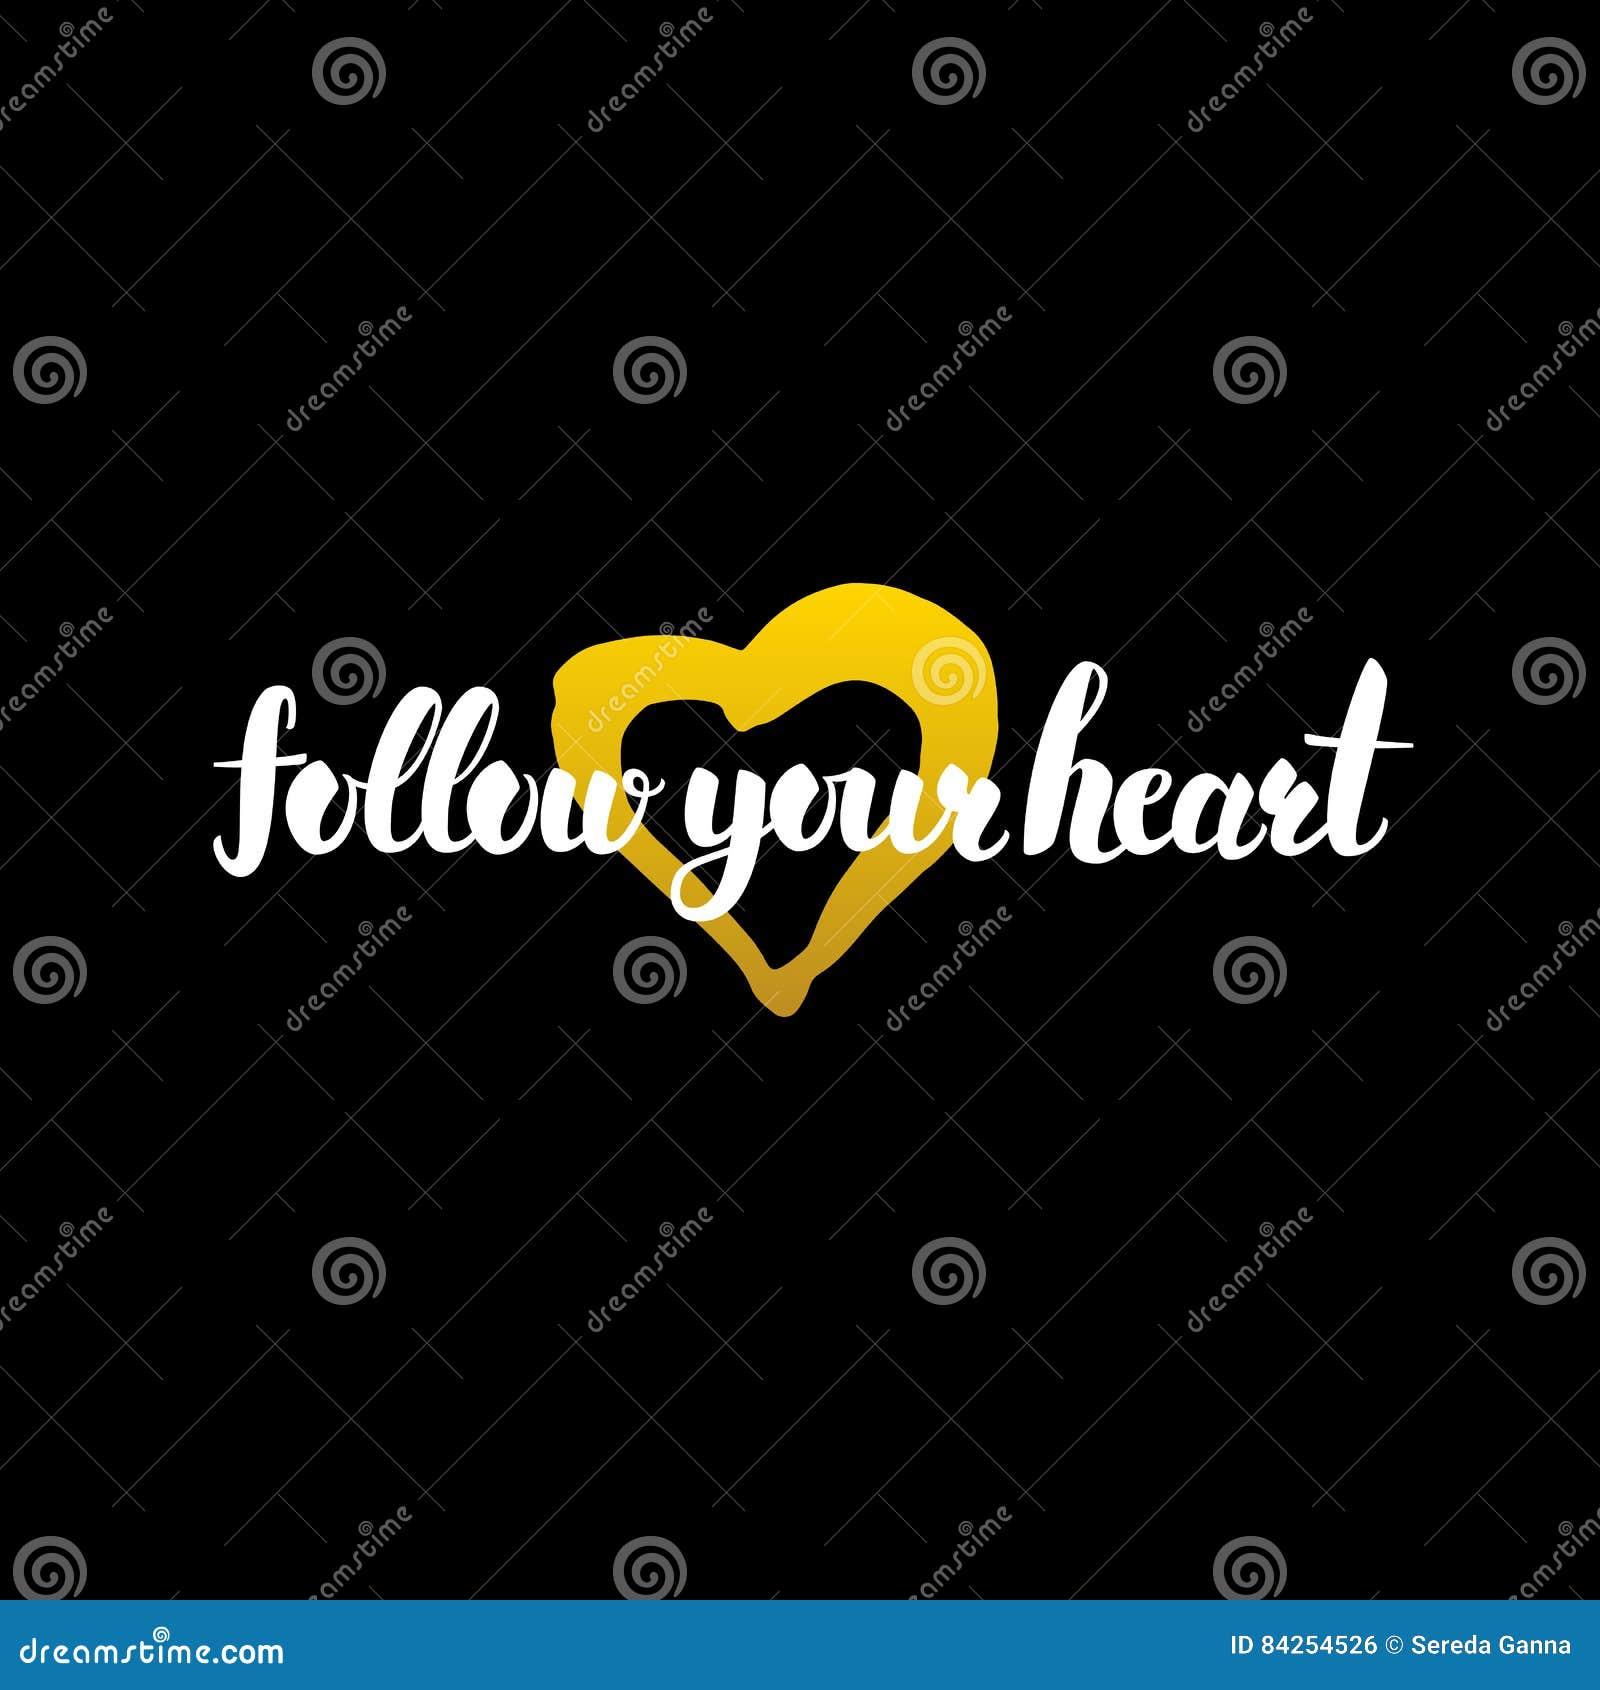 Follow Your Heart Handwritten Calligraphy Stock Vector